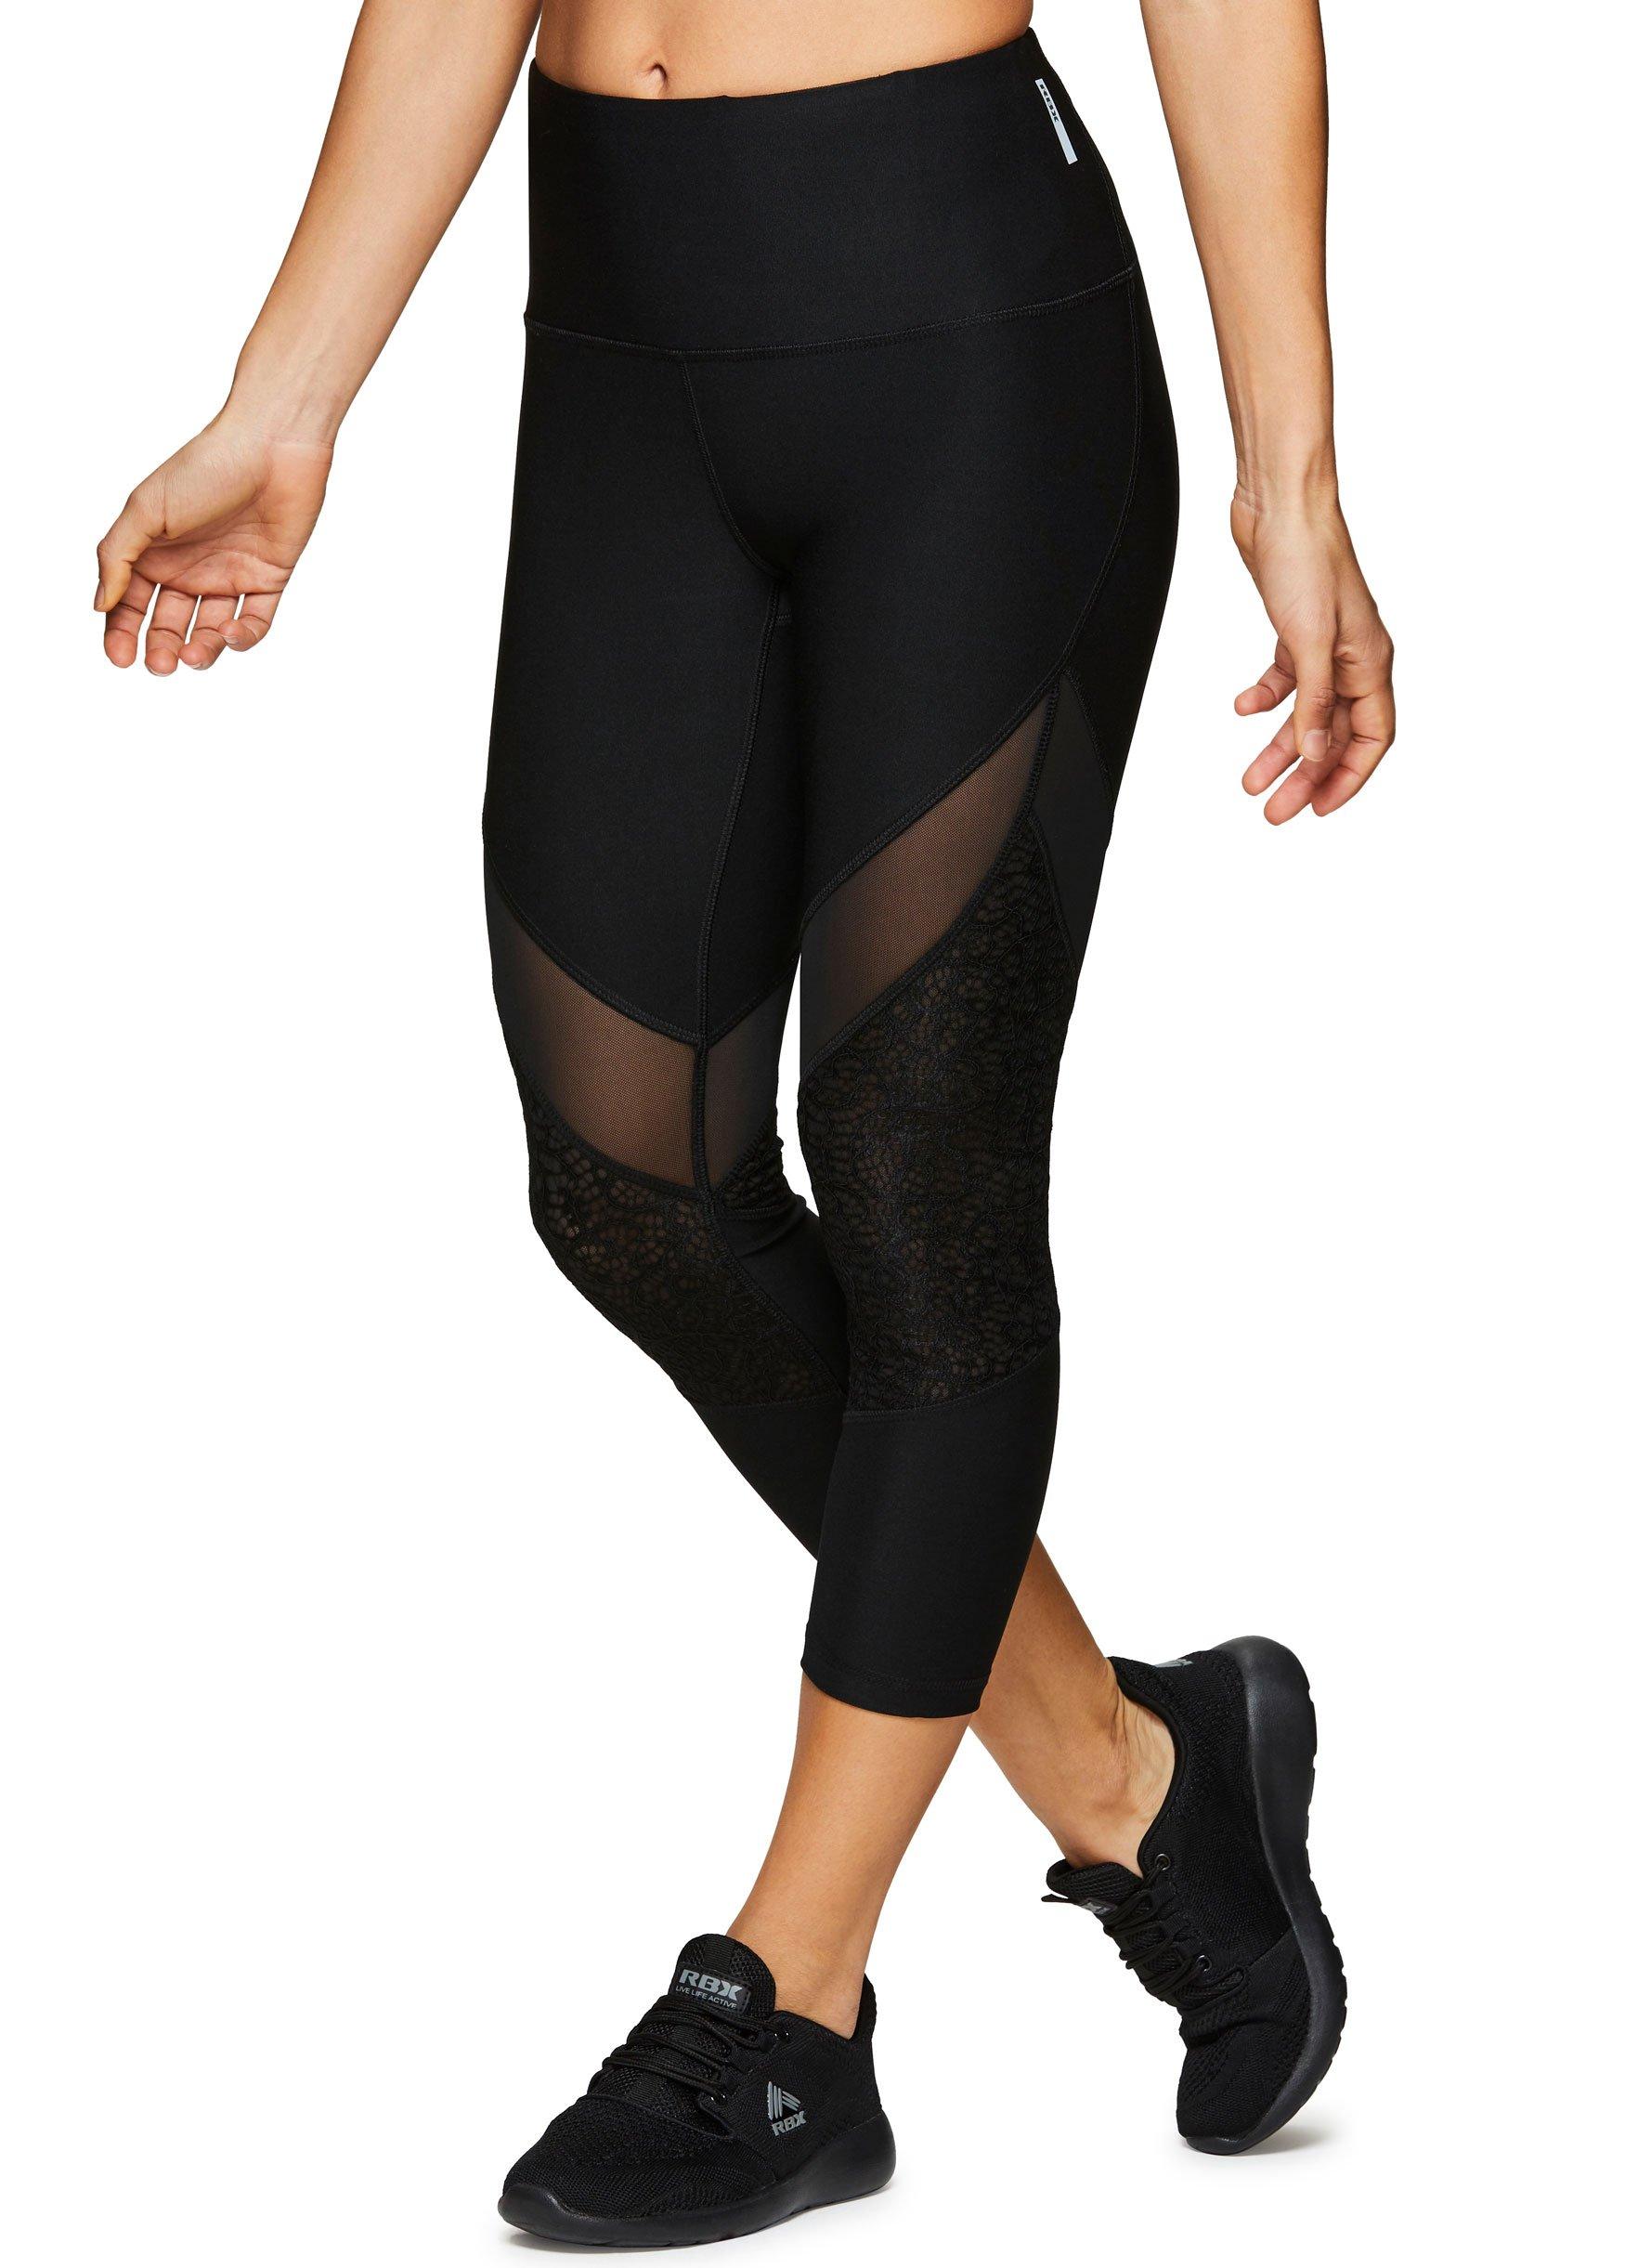 7891c4a366fdc Galleon - RBX Active Women's Workout Yoga Leggings Lace Insert Black S